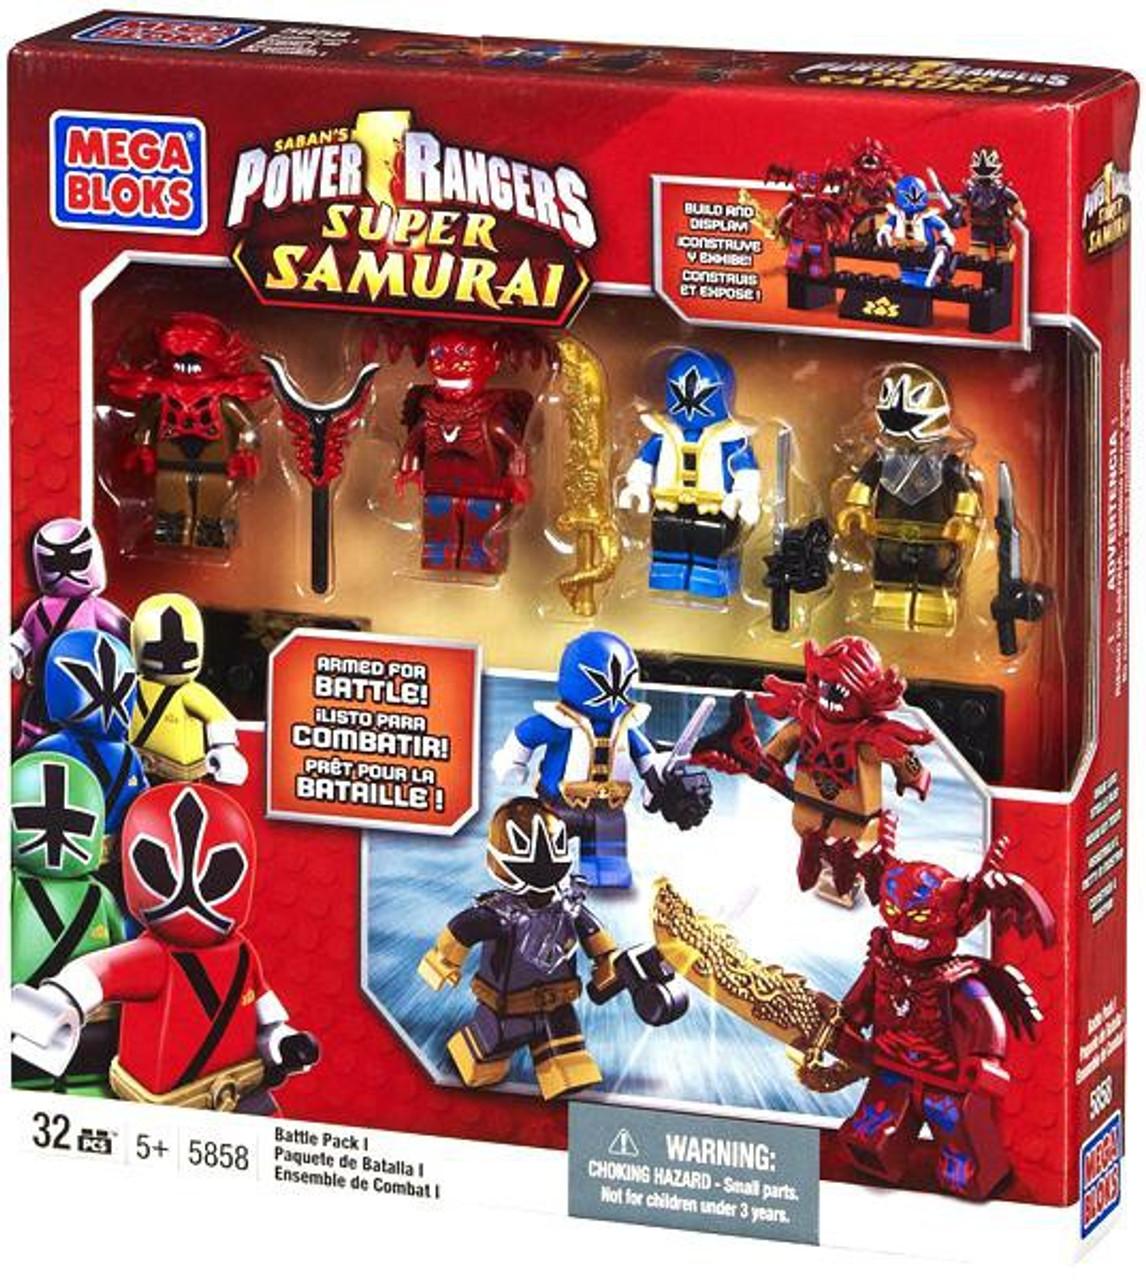 MEGA BLOKS POWER RANGERS SUPER SAMURAI TRANSLUCENT SAMURAI GOLD RANGER